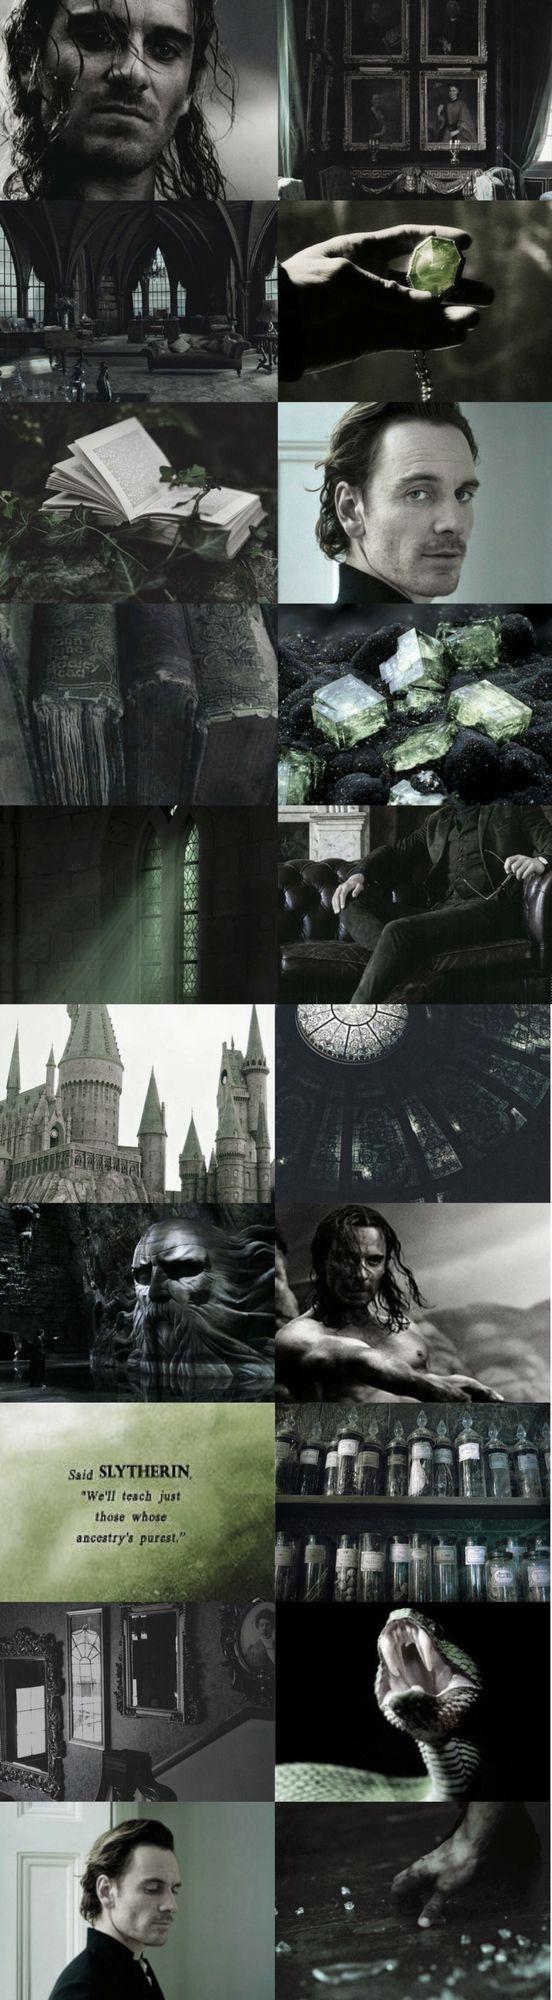 Michael Fassbender as Salazar Slytherin.  Fancast Hogwarts founders